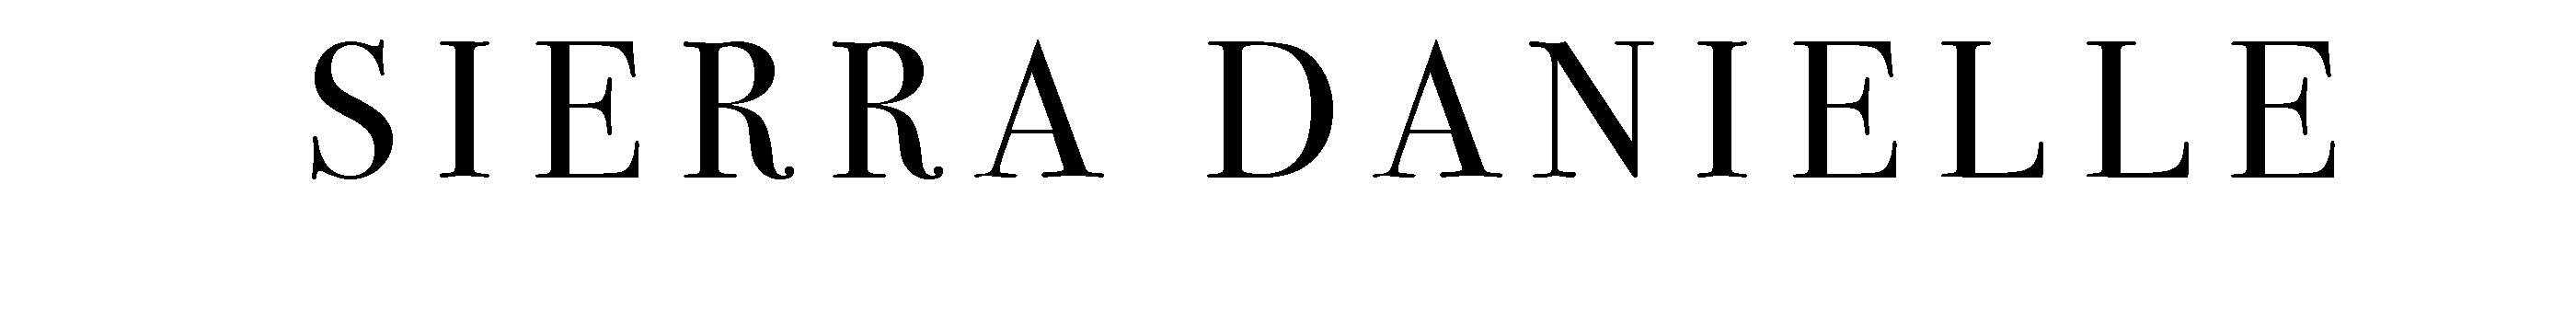 sierra danielle